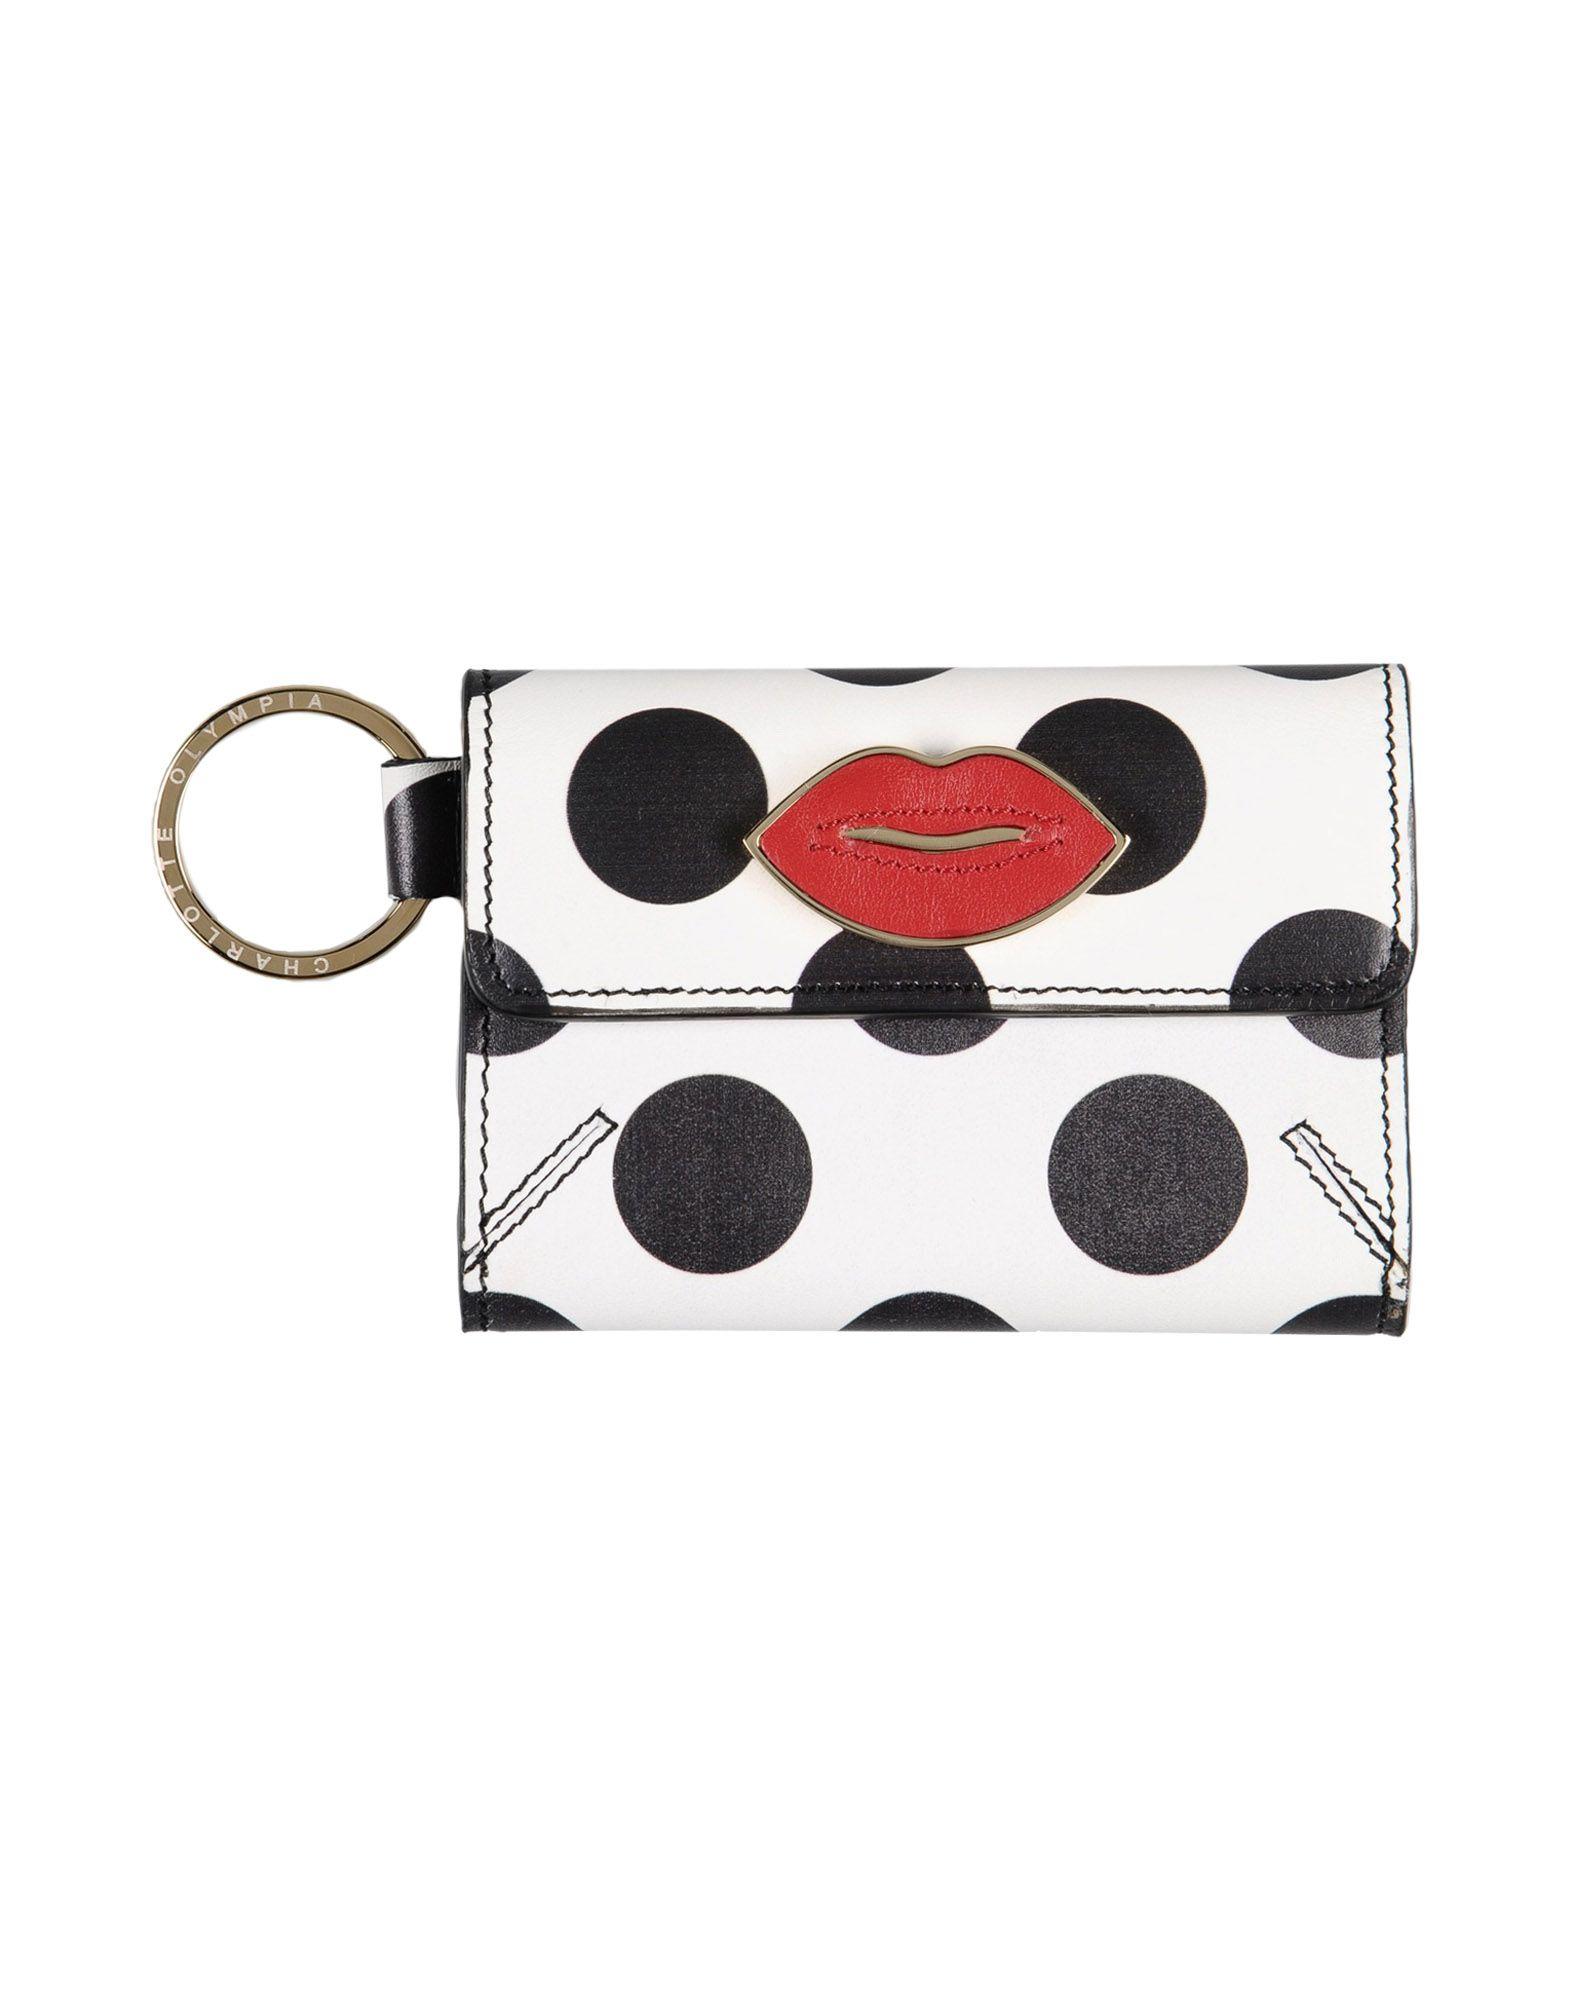 Фото - CHARLOTTE OLYMPIA Кошелек для монет charlotte olympia кошелек из металлизированной кожи pouty purse